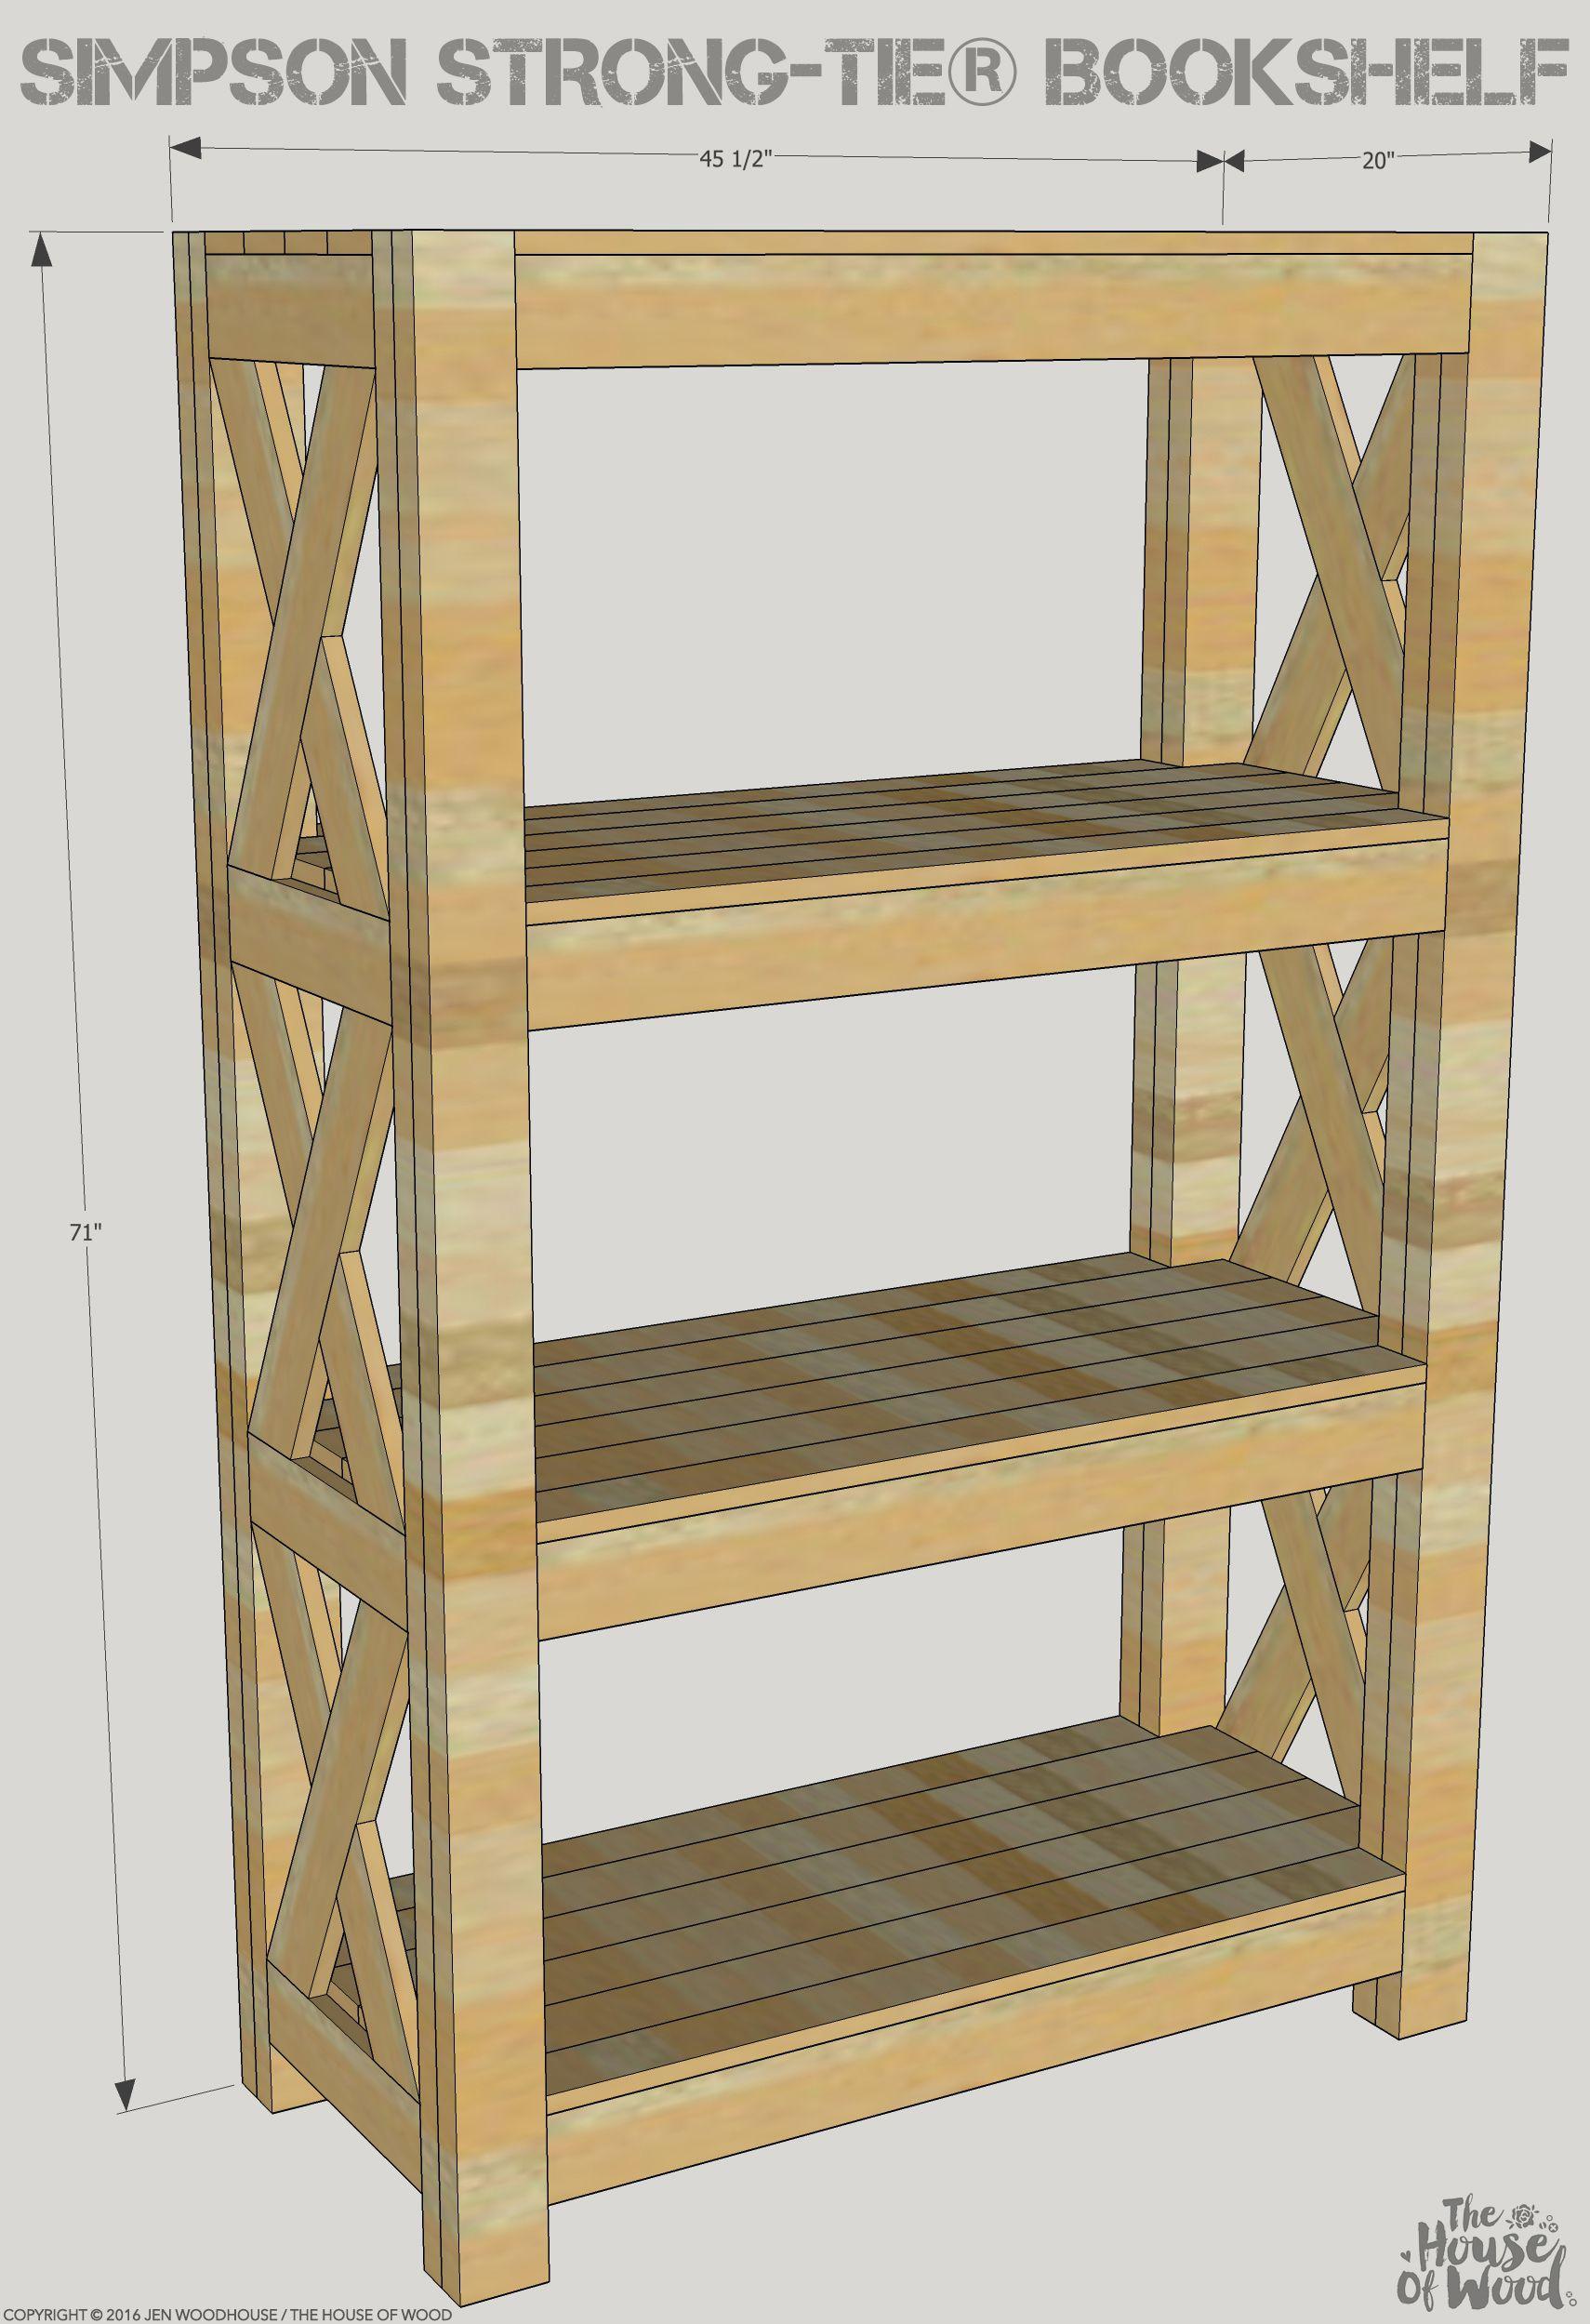 Diy Bookshelf With Simpson Strong Tie Bookshelves Diy Bookcase